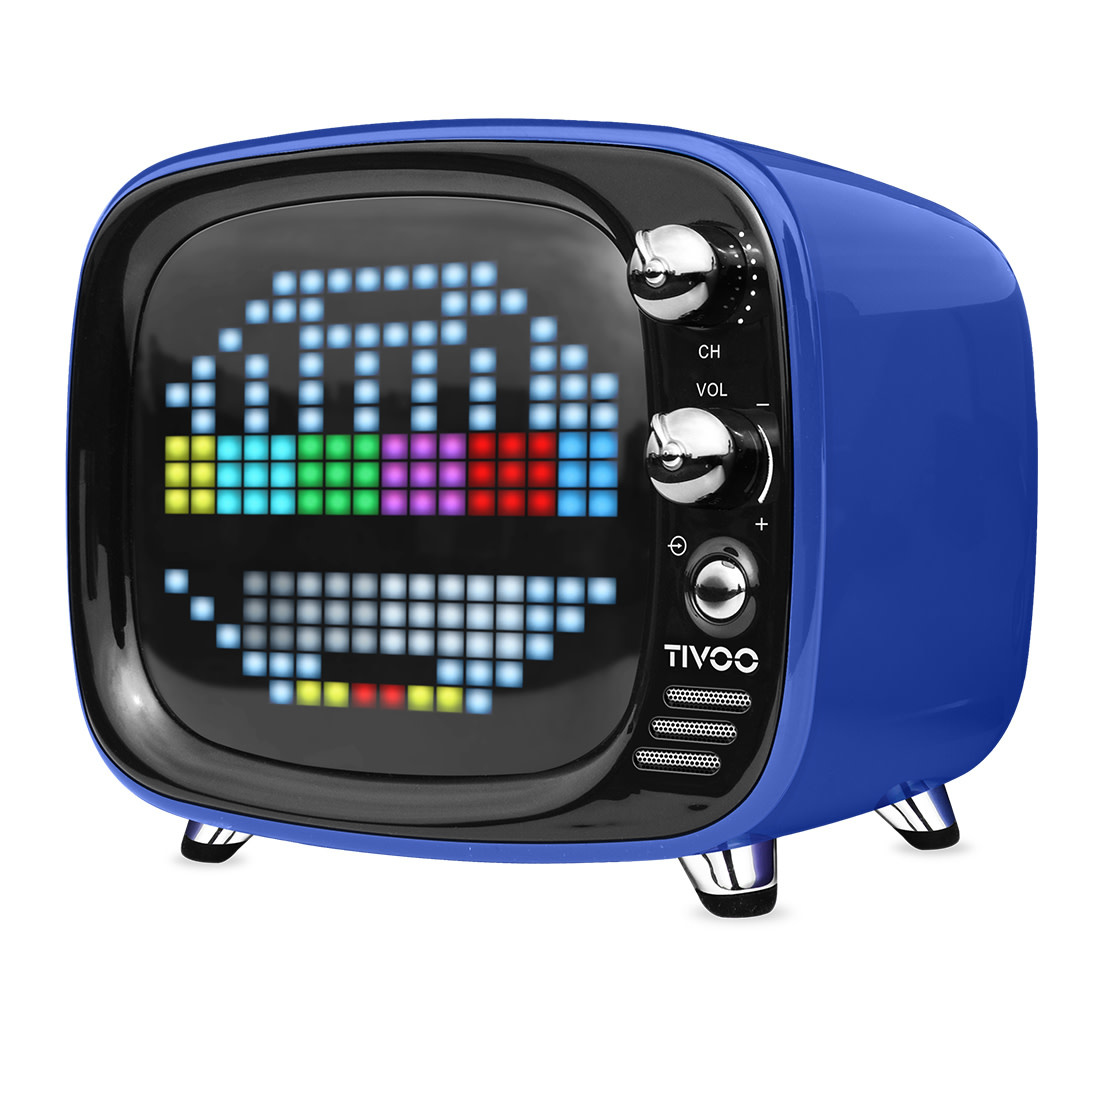 M24 TIVOO, BLUE-1